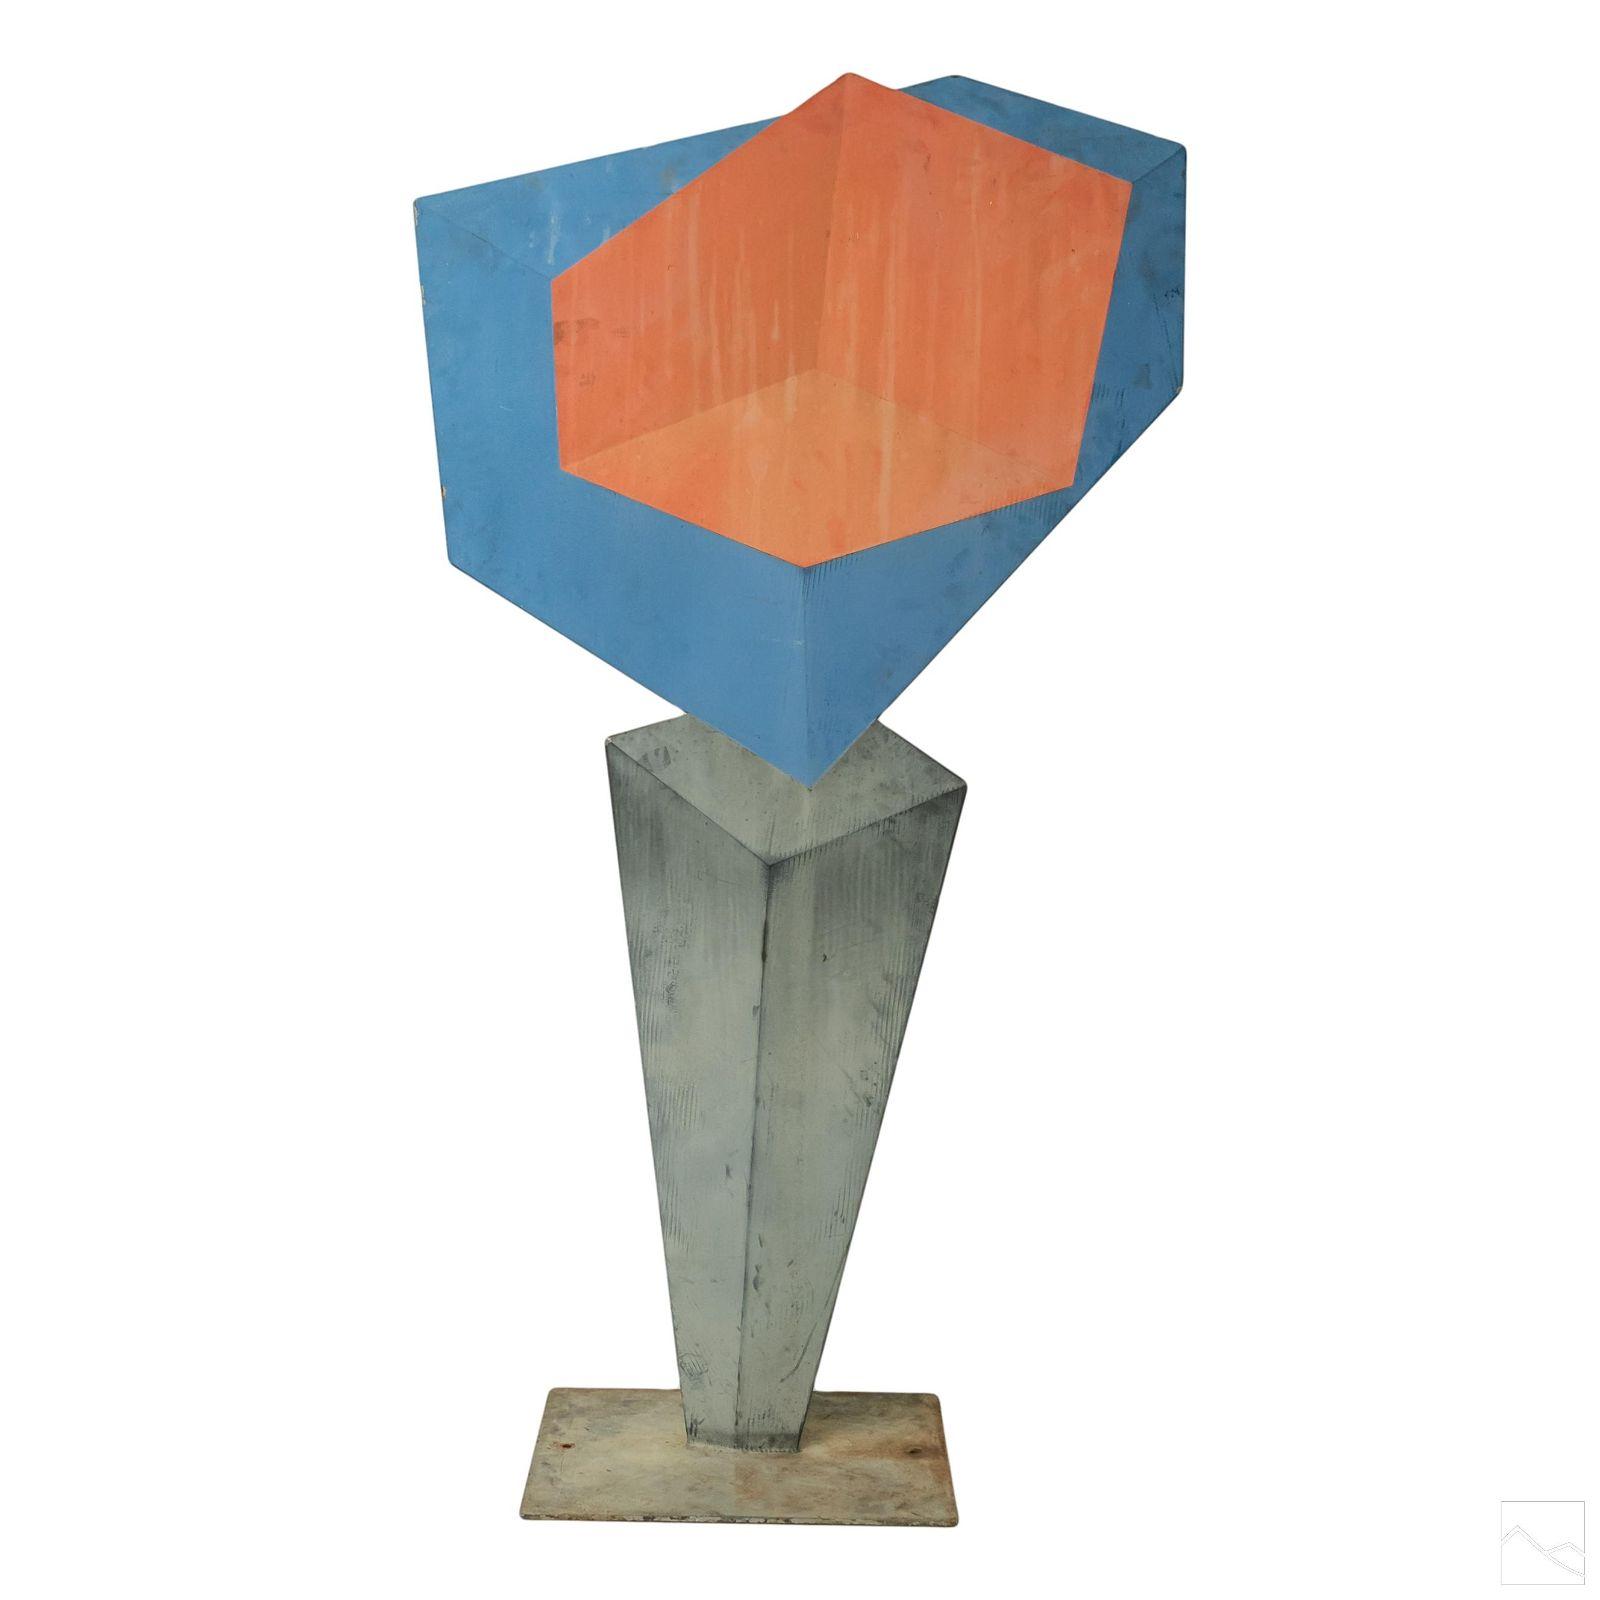 Monumental Op Art Abstract Geometry Iron Sculpture